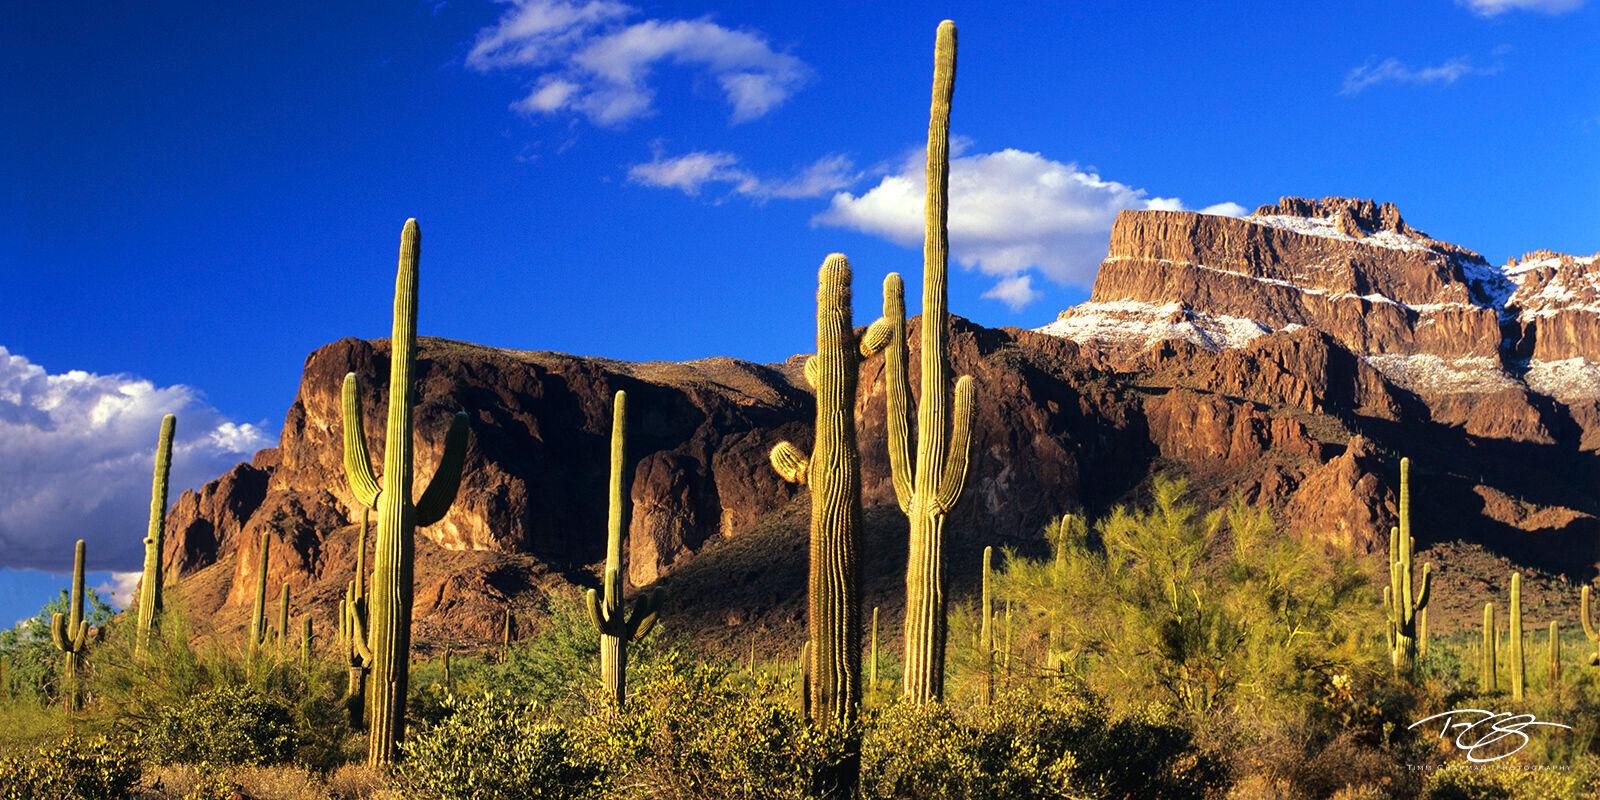 Arizona, Superstition Mountain, Superstition snows, snow on Superstition Mountain, cactus, saguaro, superstition wildersness, snow in the desert, golden light, snow, saguaro cactus, cacti, panorama, photo